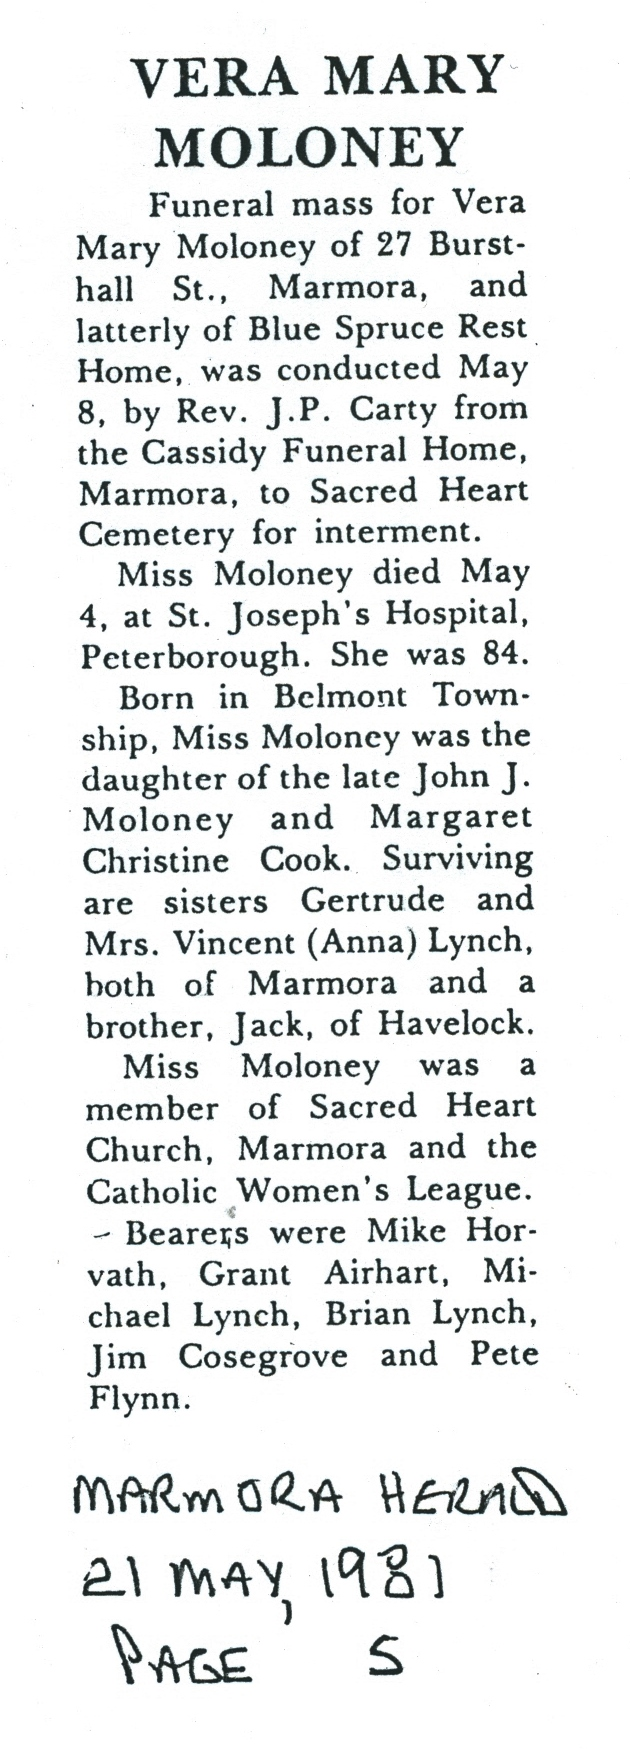 Maloney, Vera Mary.jpg